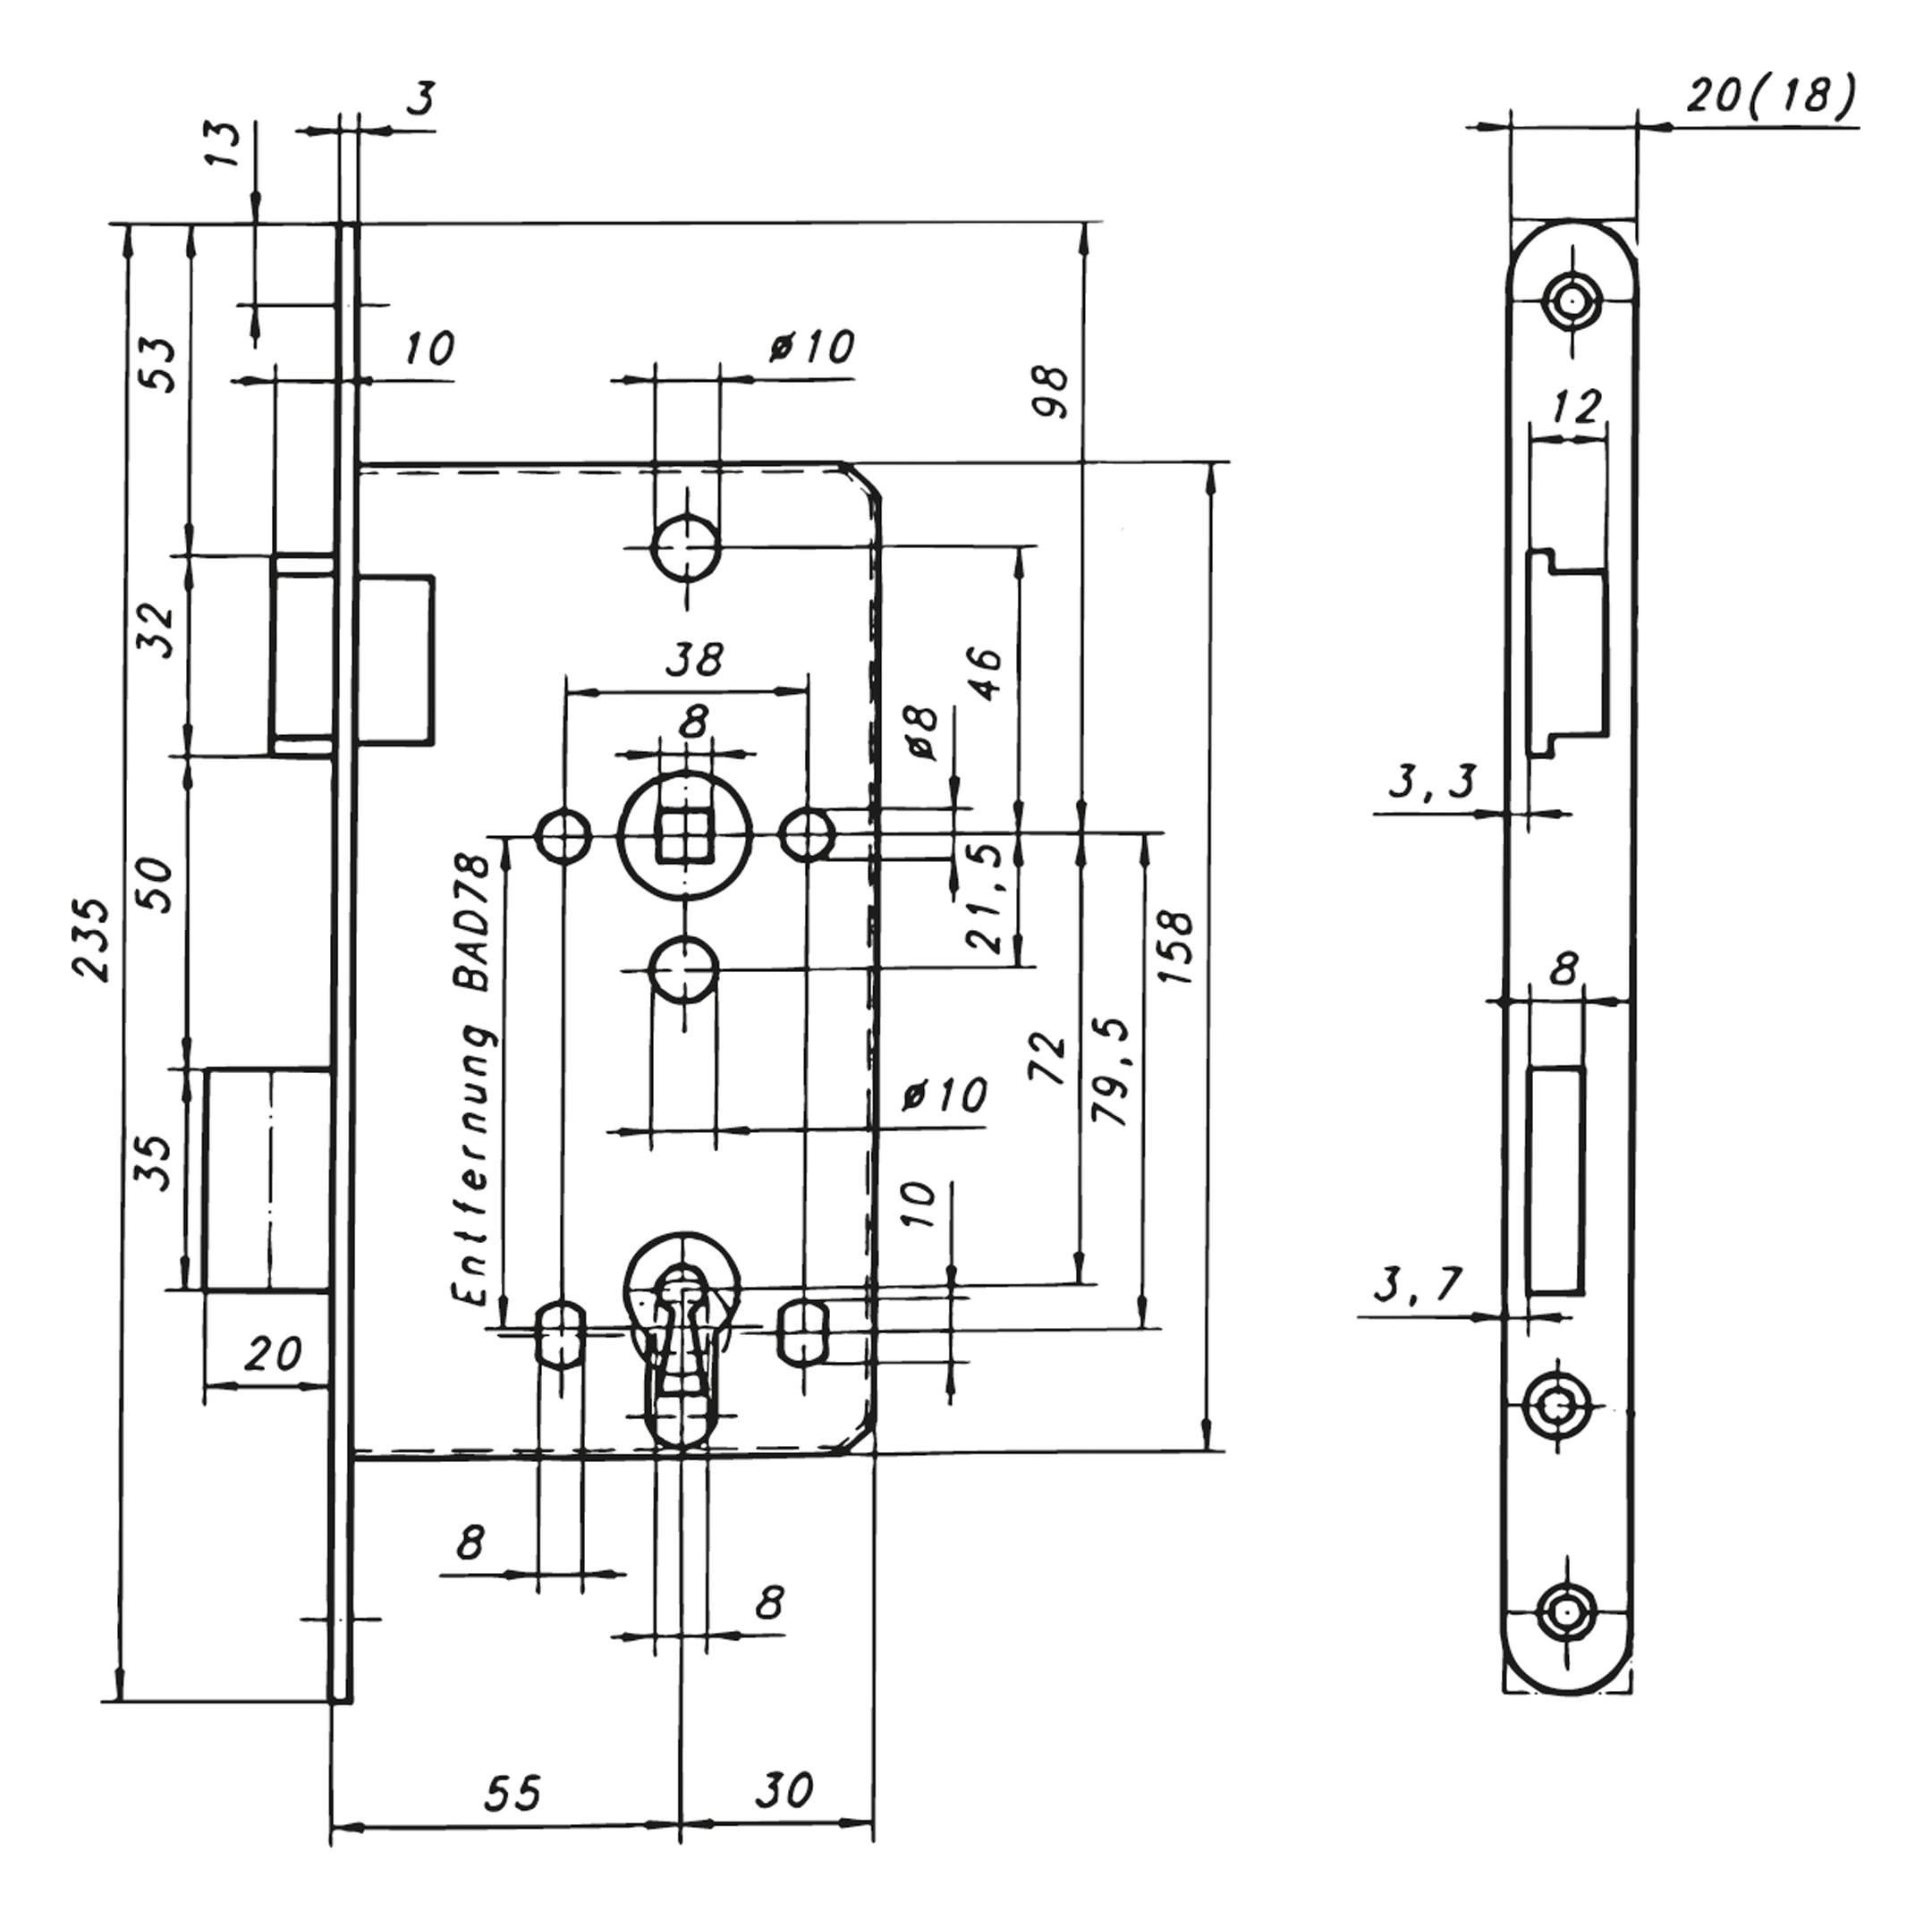 sächsische schlossfabrik zimmertür-einsteckschloss 8/55/ 78mm wc din